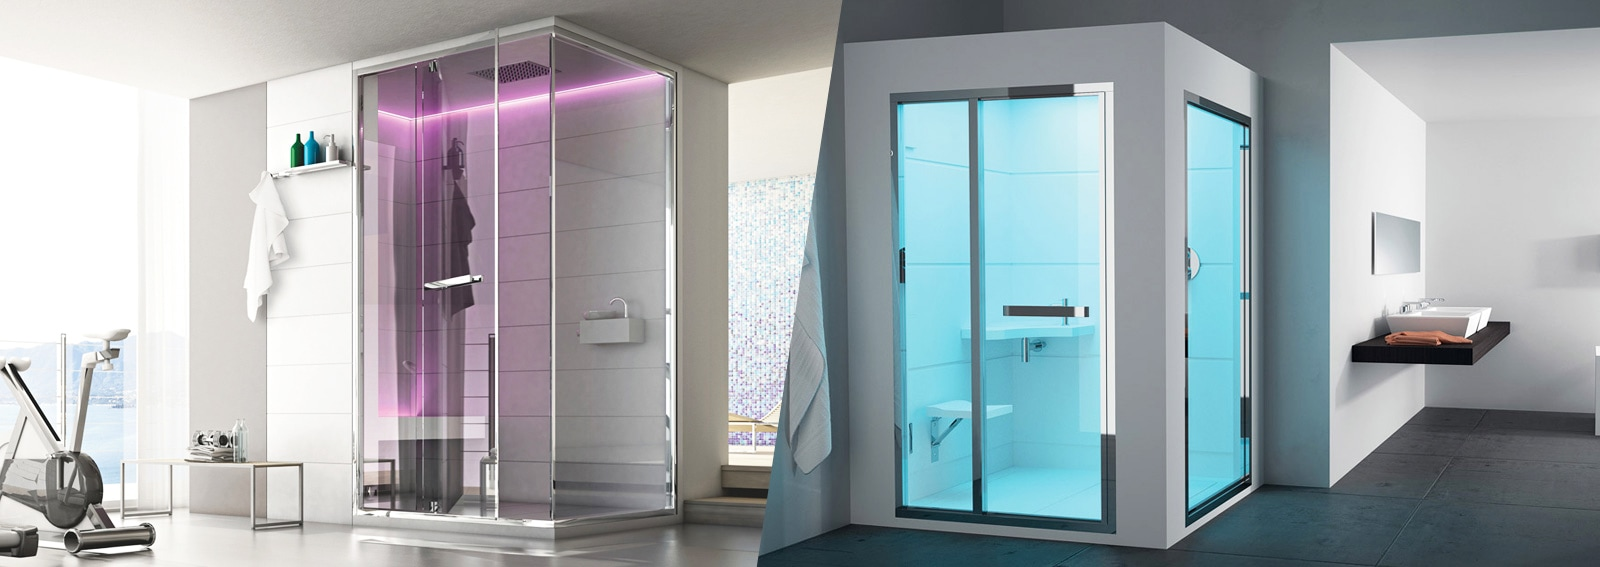 Doccia Moderna Industrial Bathroom Bathroom Industrial With